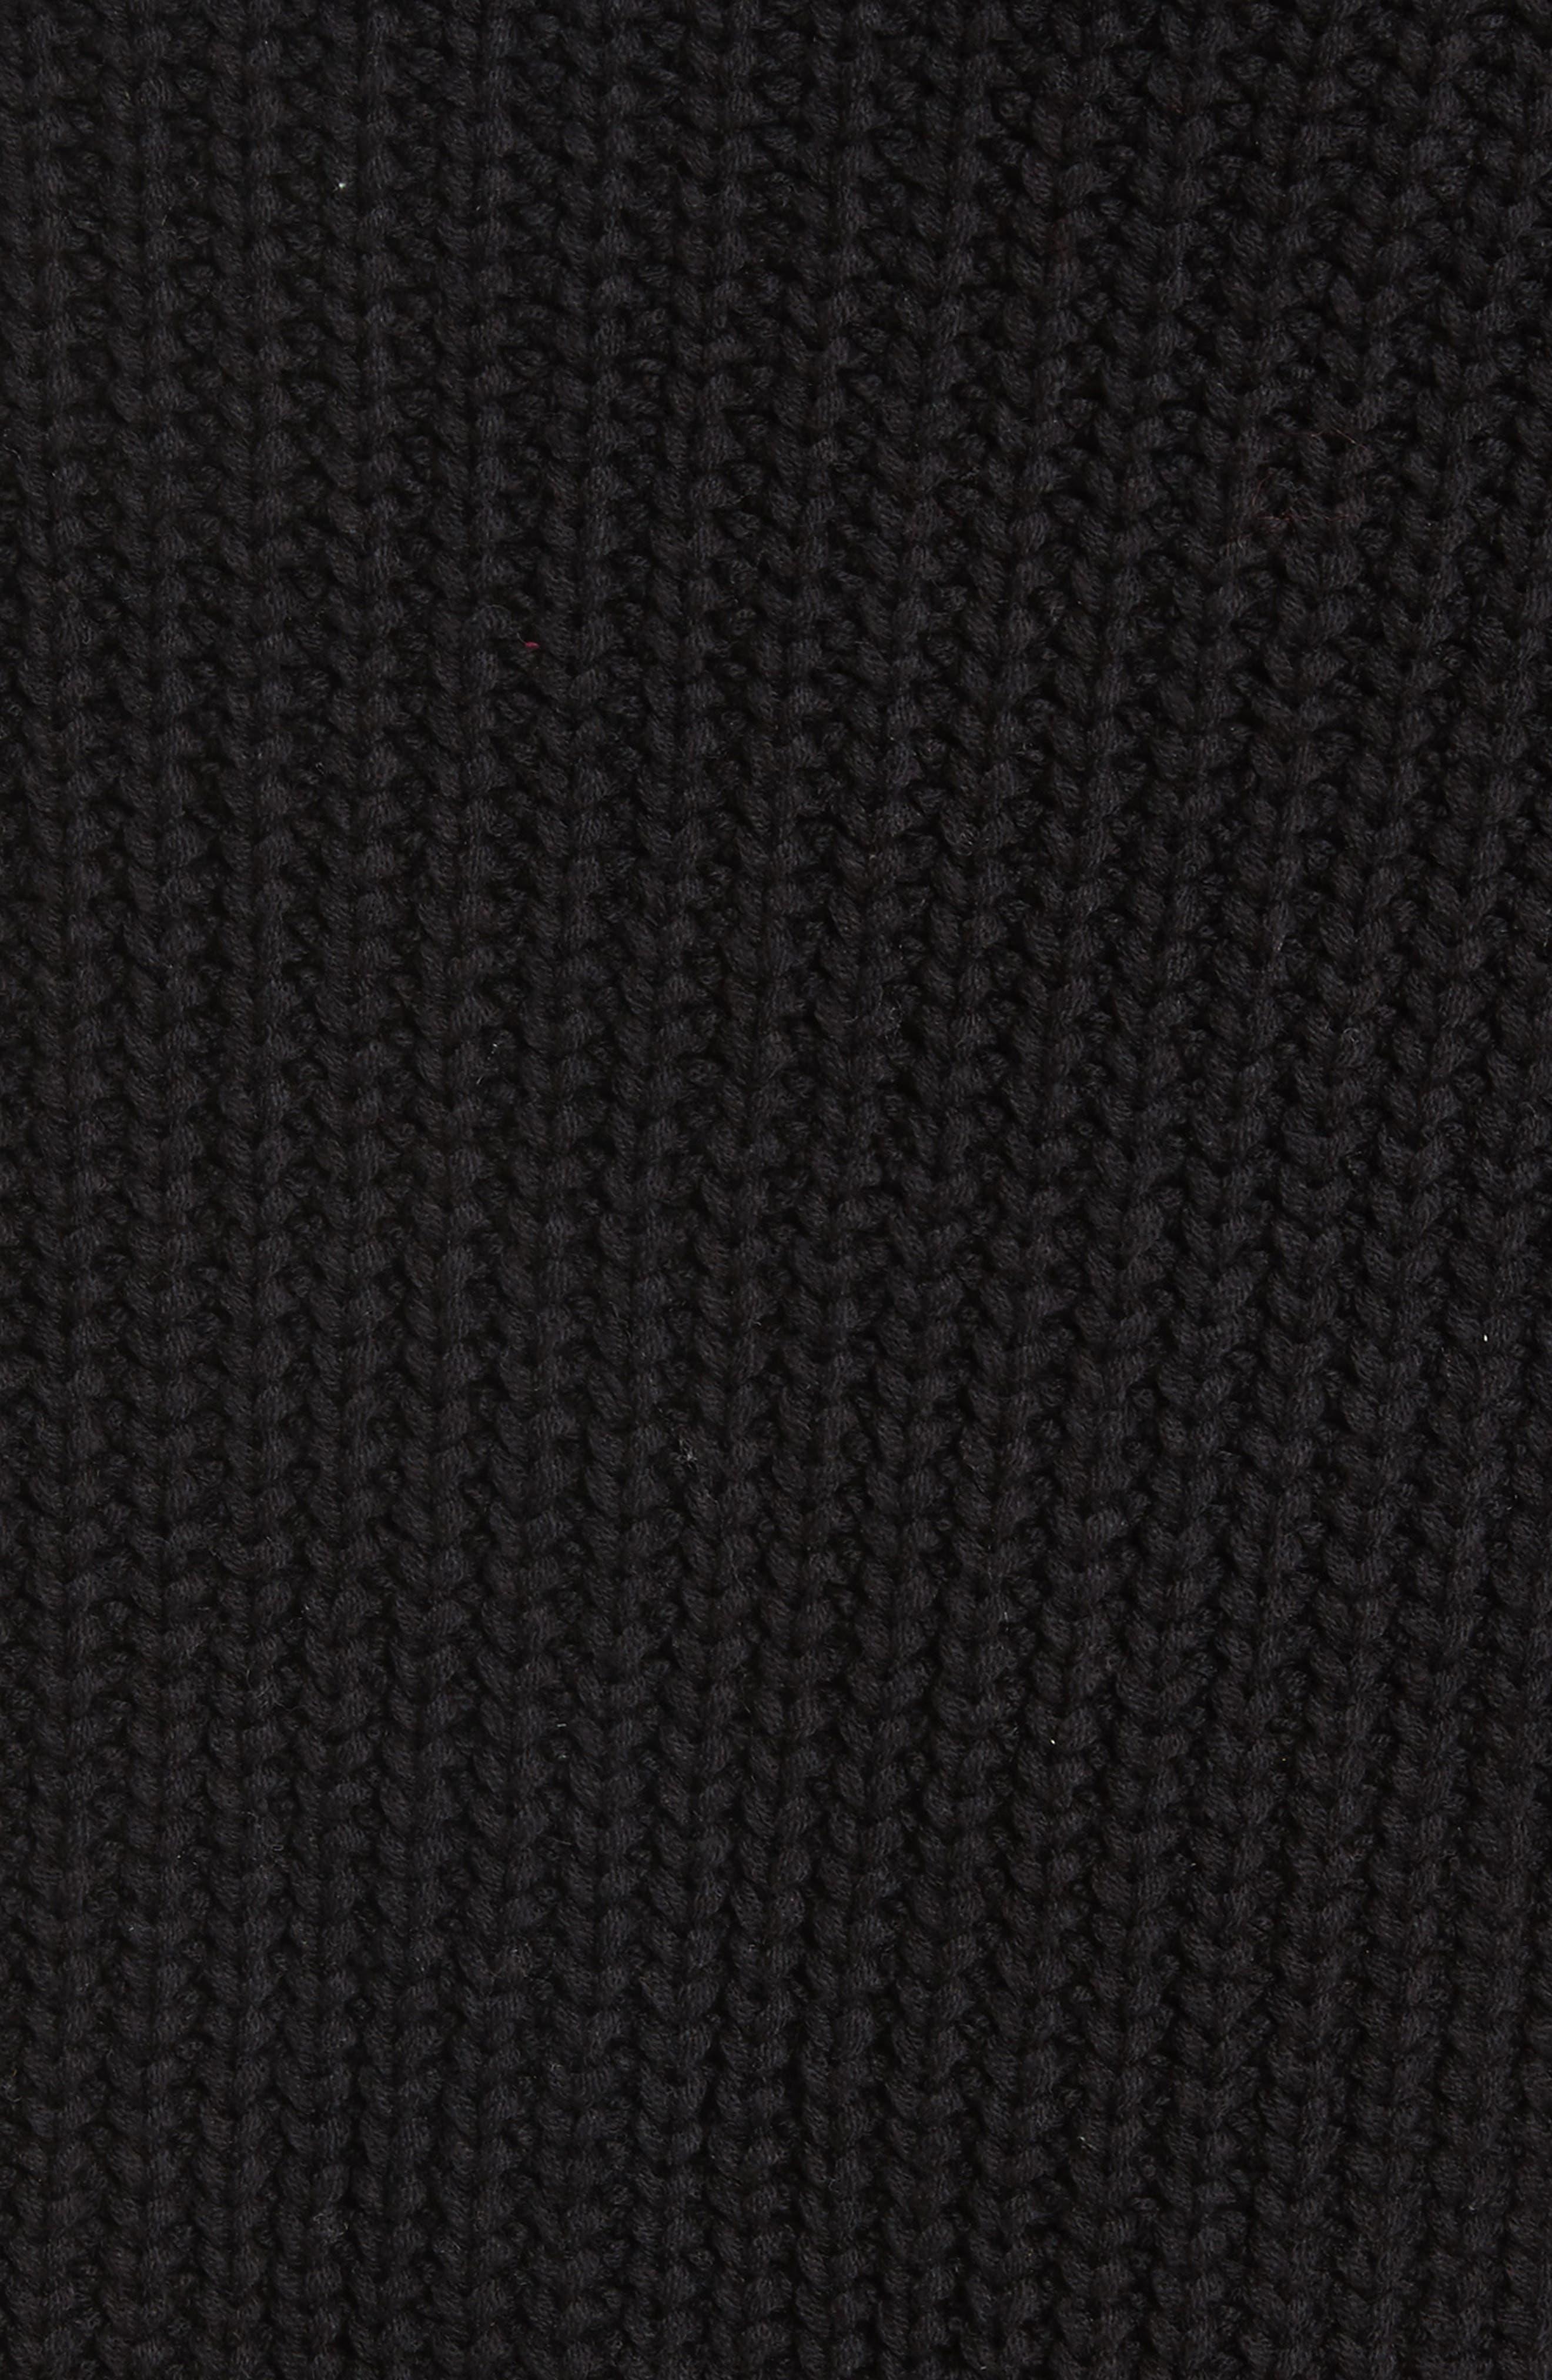 Swim Too Deep Turtleneck Sweater,                             Alternate thumbnail 5, color,                             001